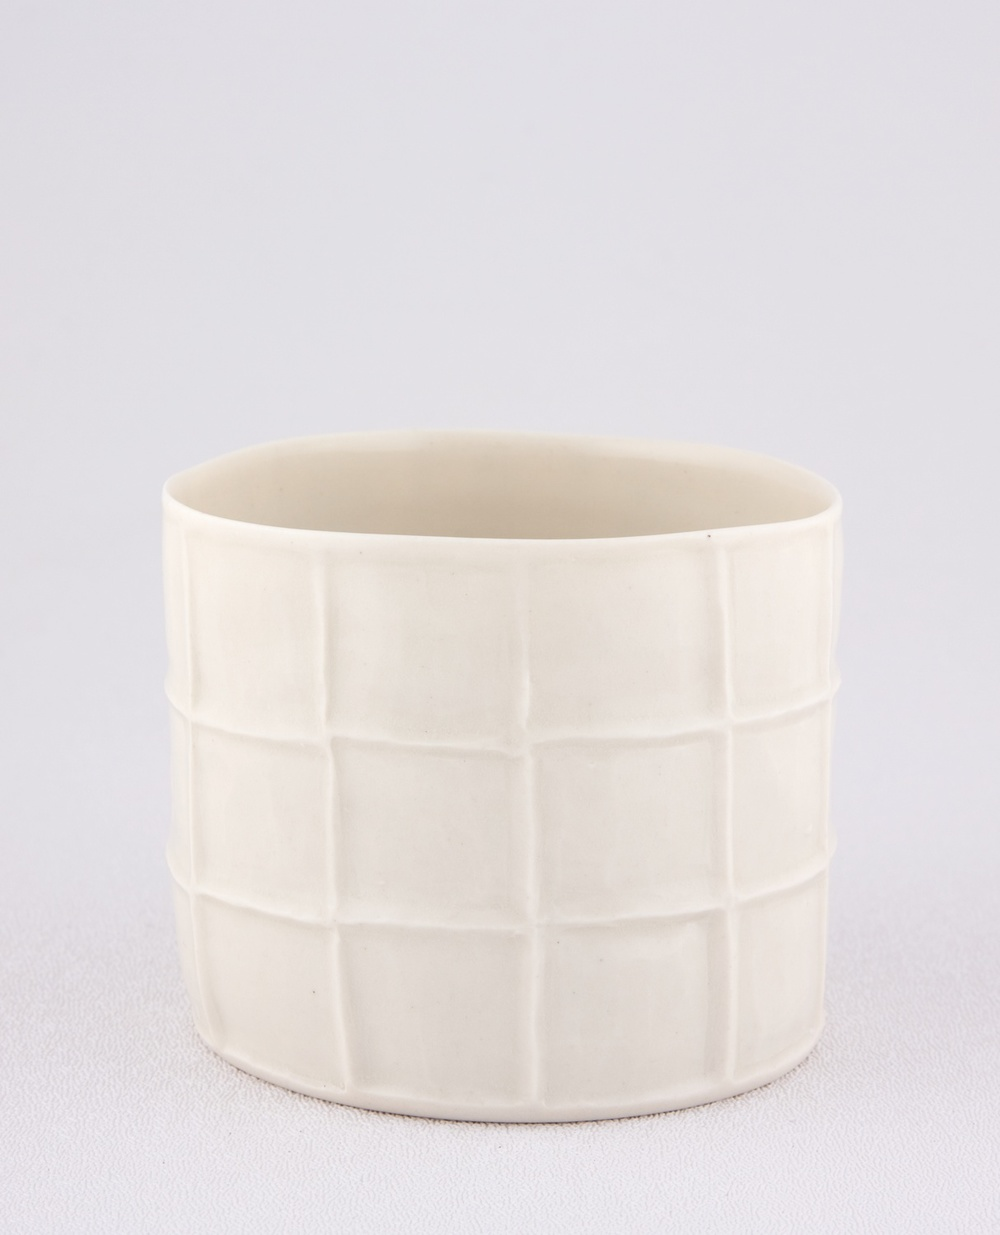 Shio Kusaka  Untitled (cup)  2009 Porcelain 2 ¾h x 3 ¼w in SK011